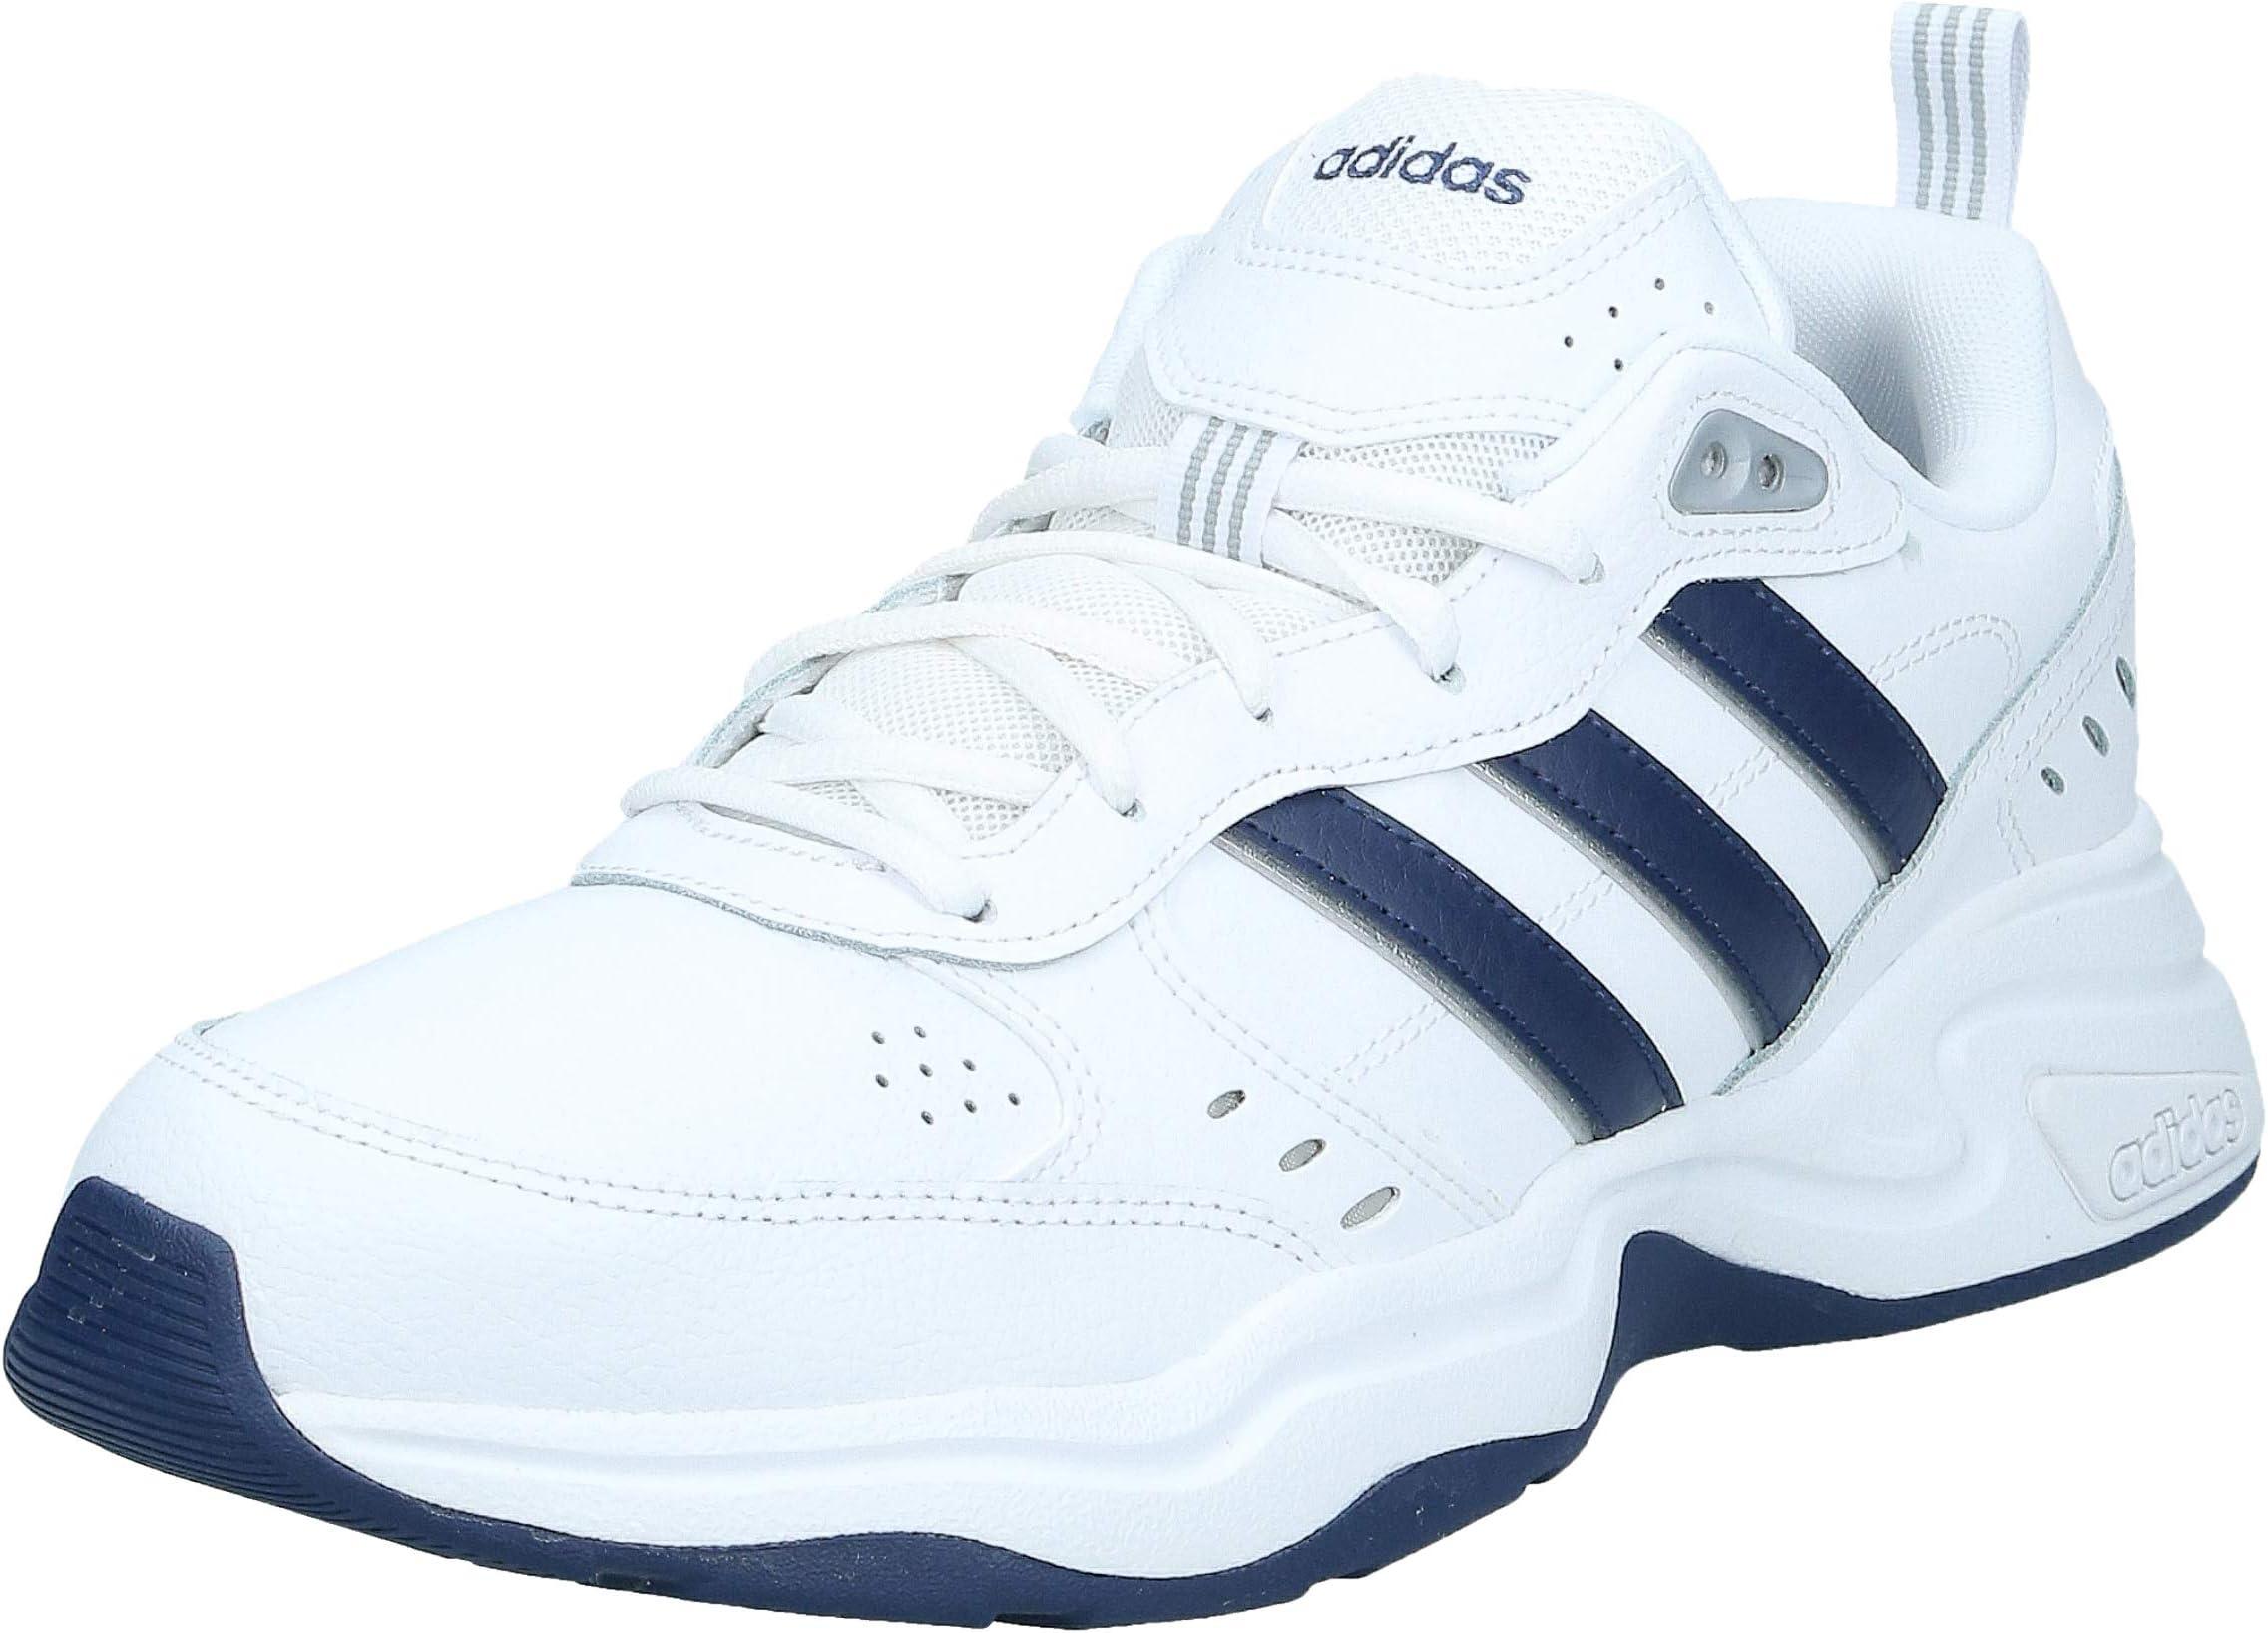 Fitness \u0026 Cross Training Shoes